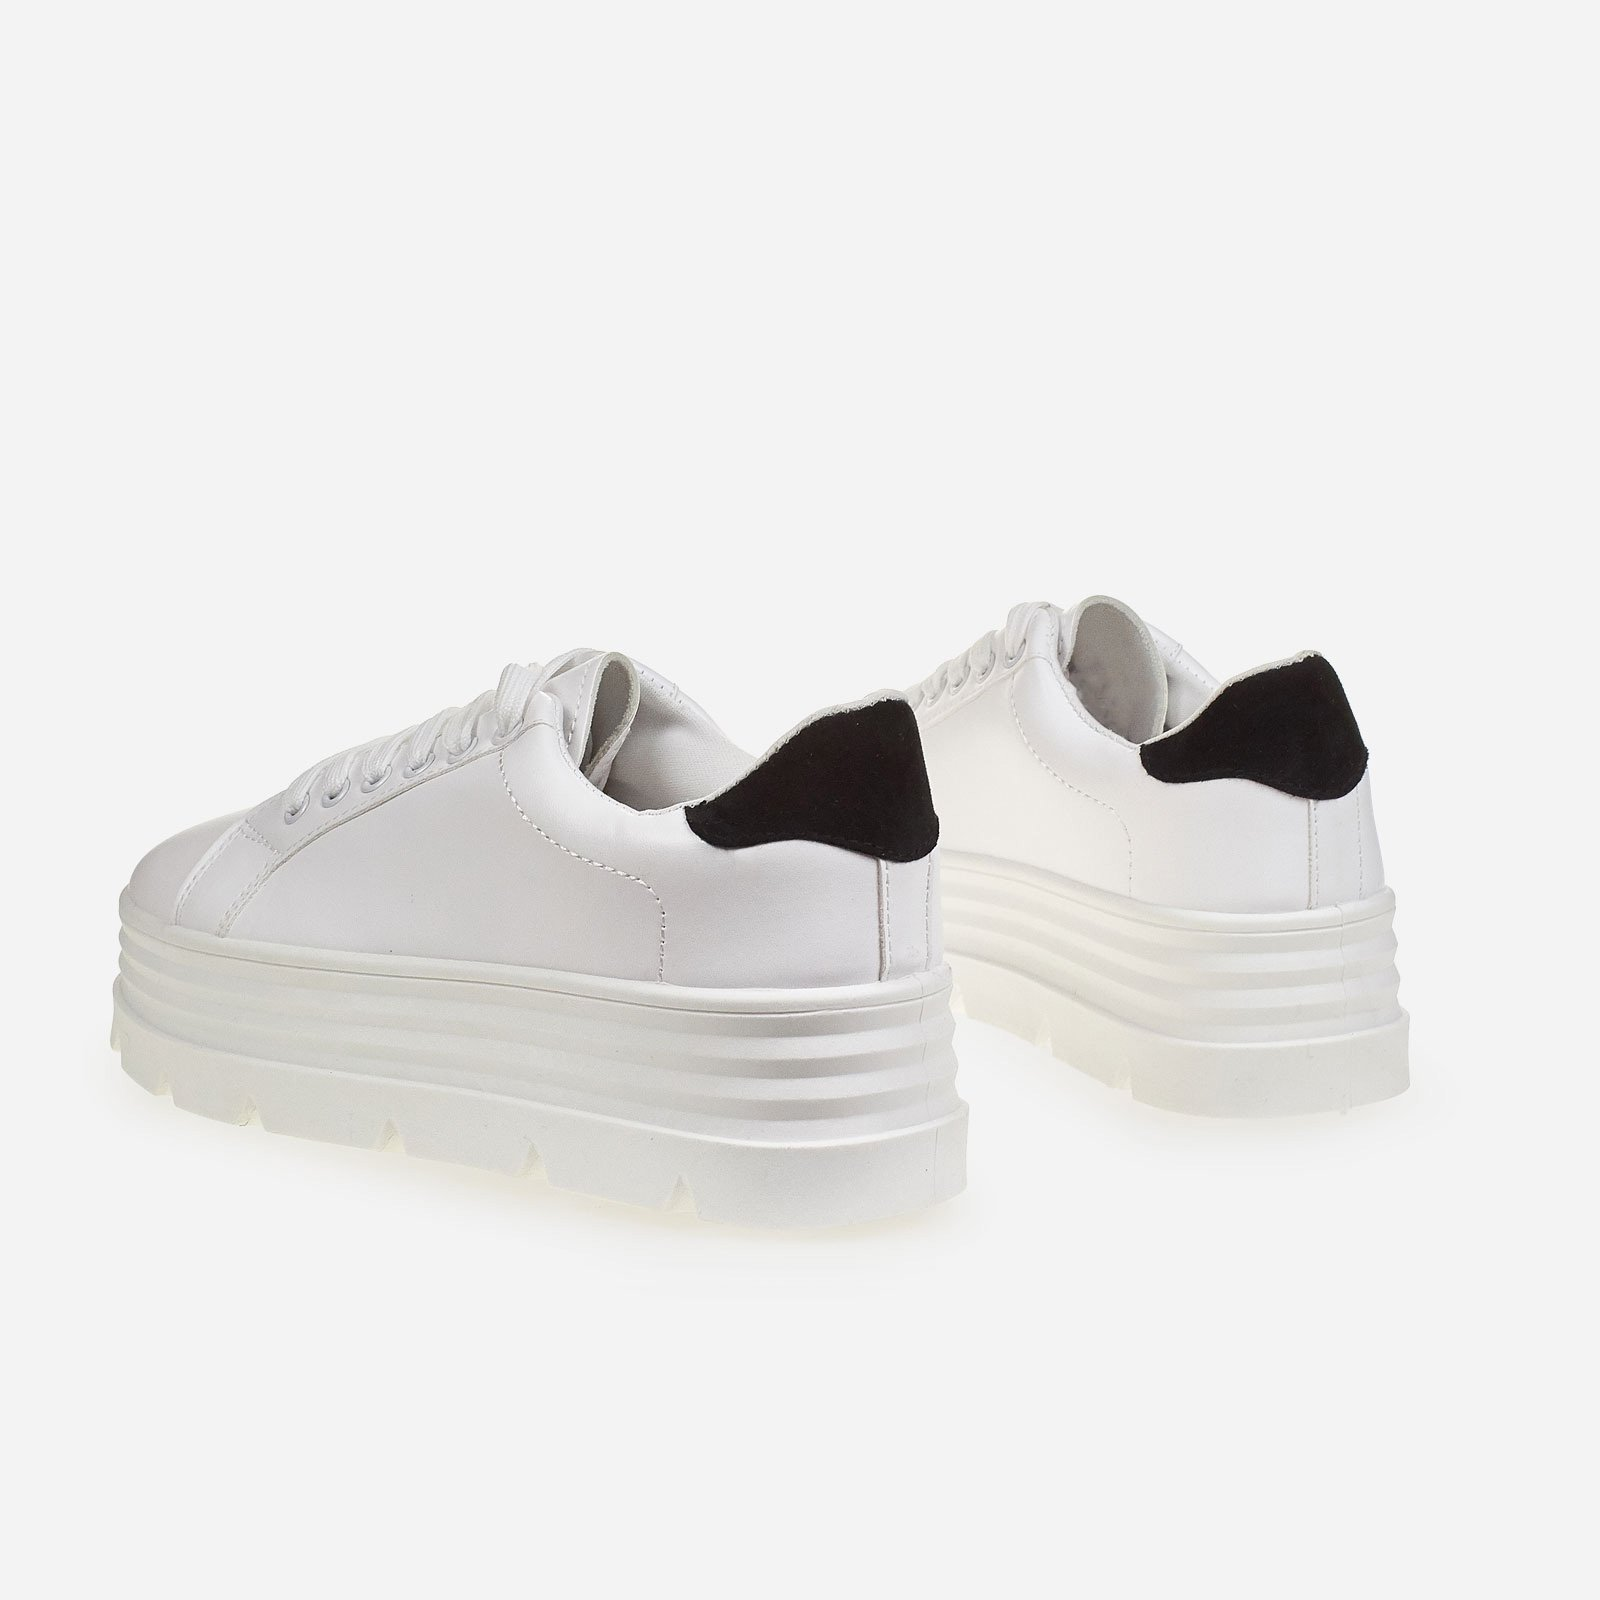 Fierce Black Heel Tab Platform Trainer In White Faux Leather